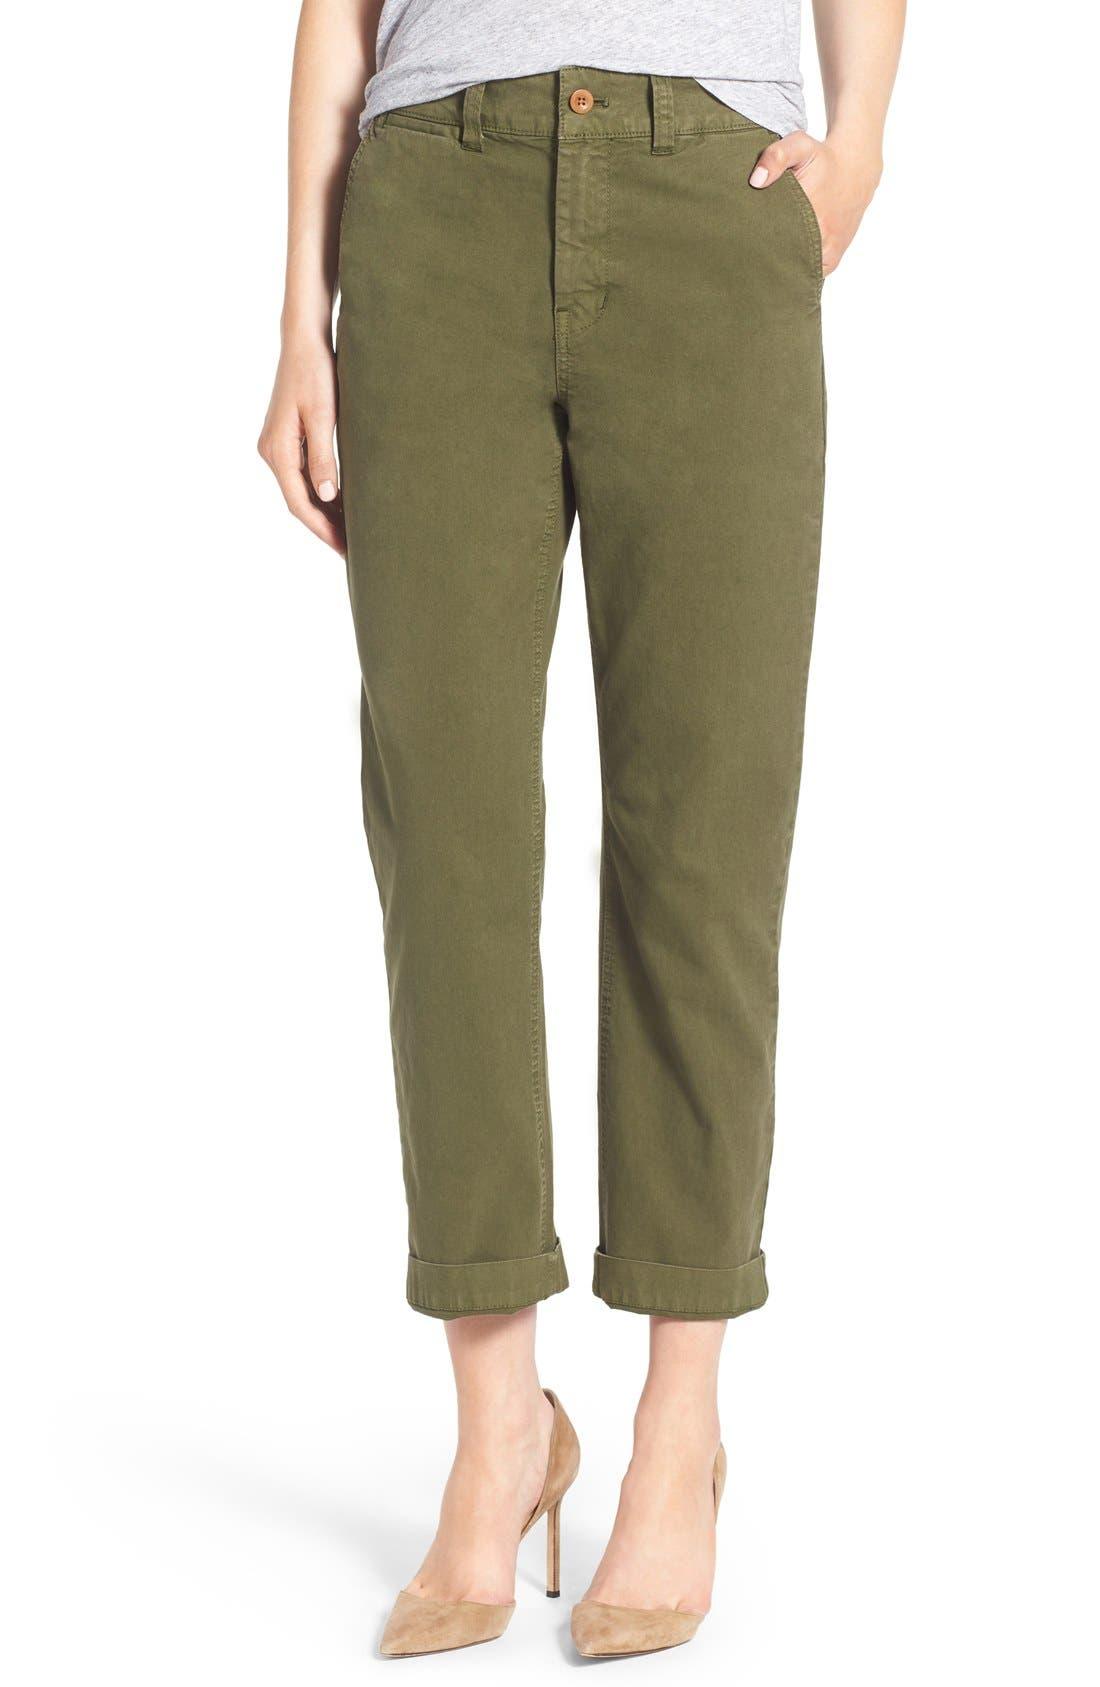 Main Image - Madewell High Rise Straight Leg Chino Pants